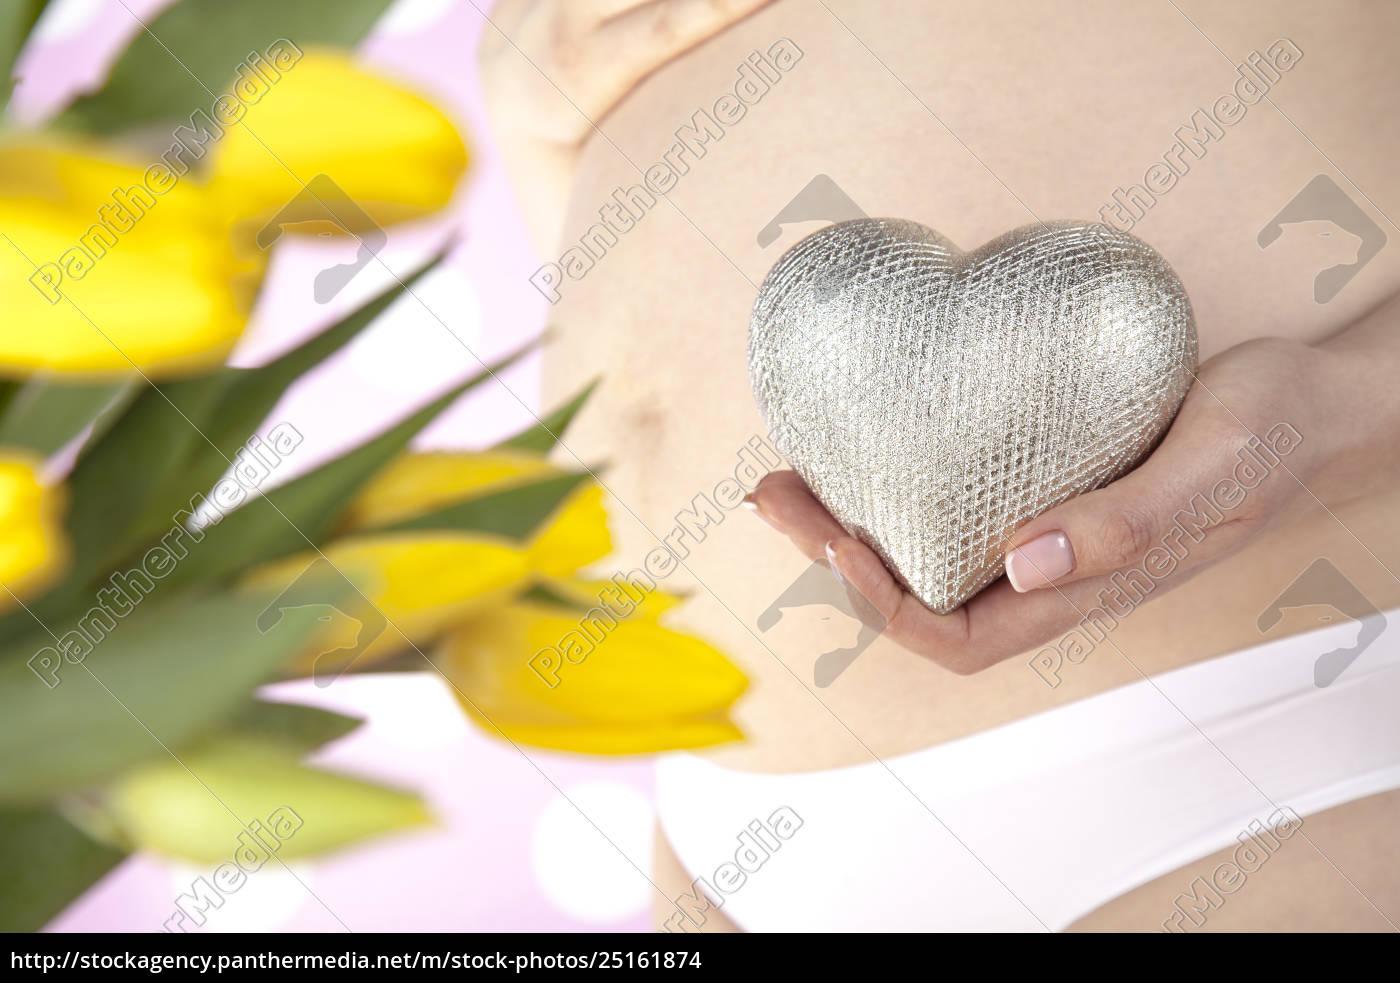 close, up, of, a, cute, pregnant - 25161874